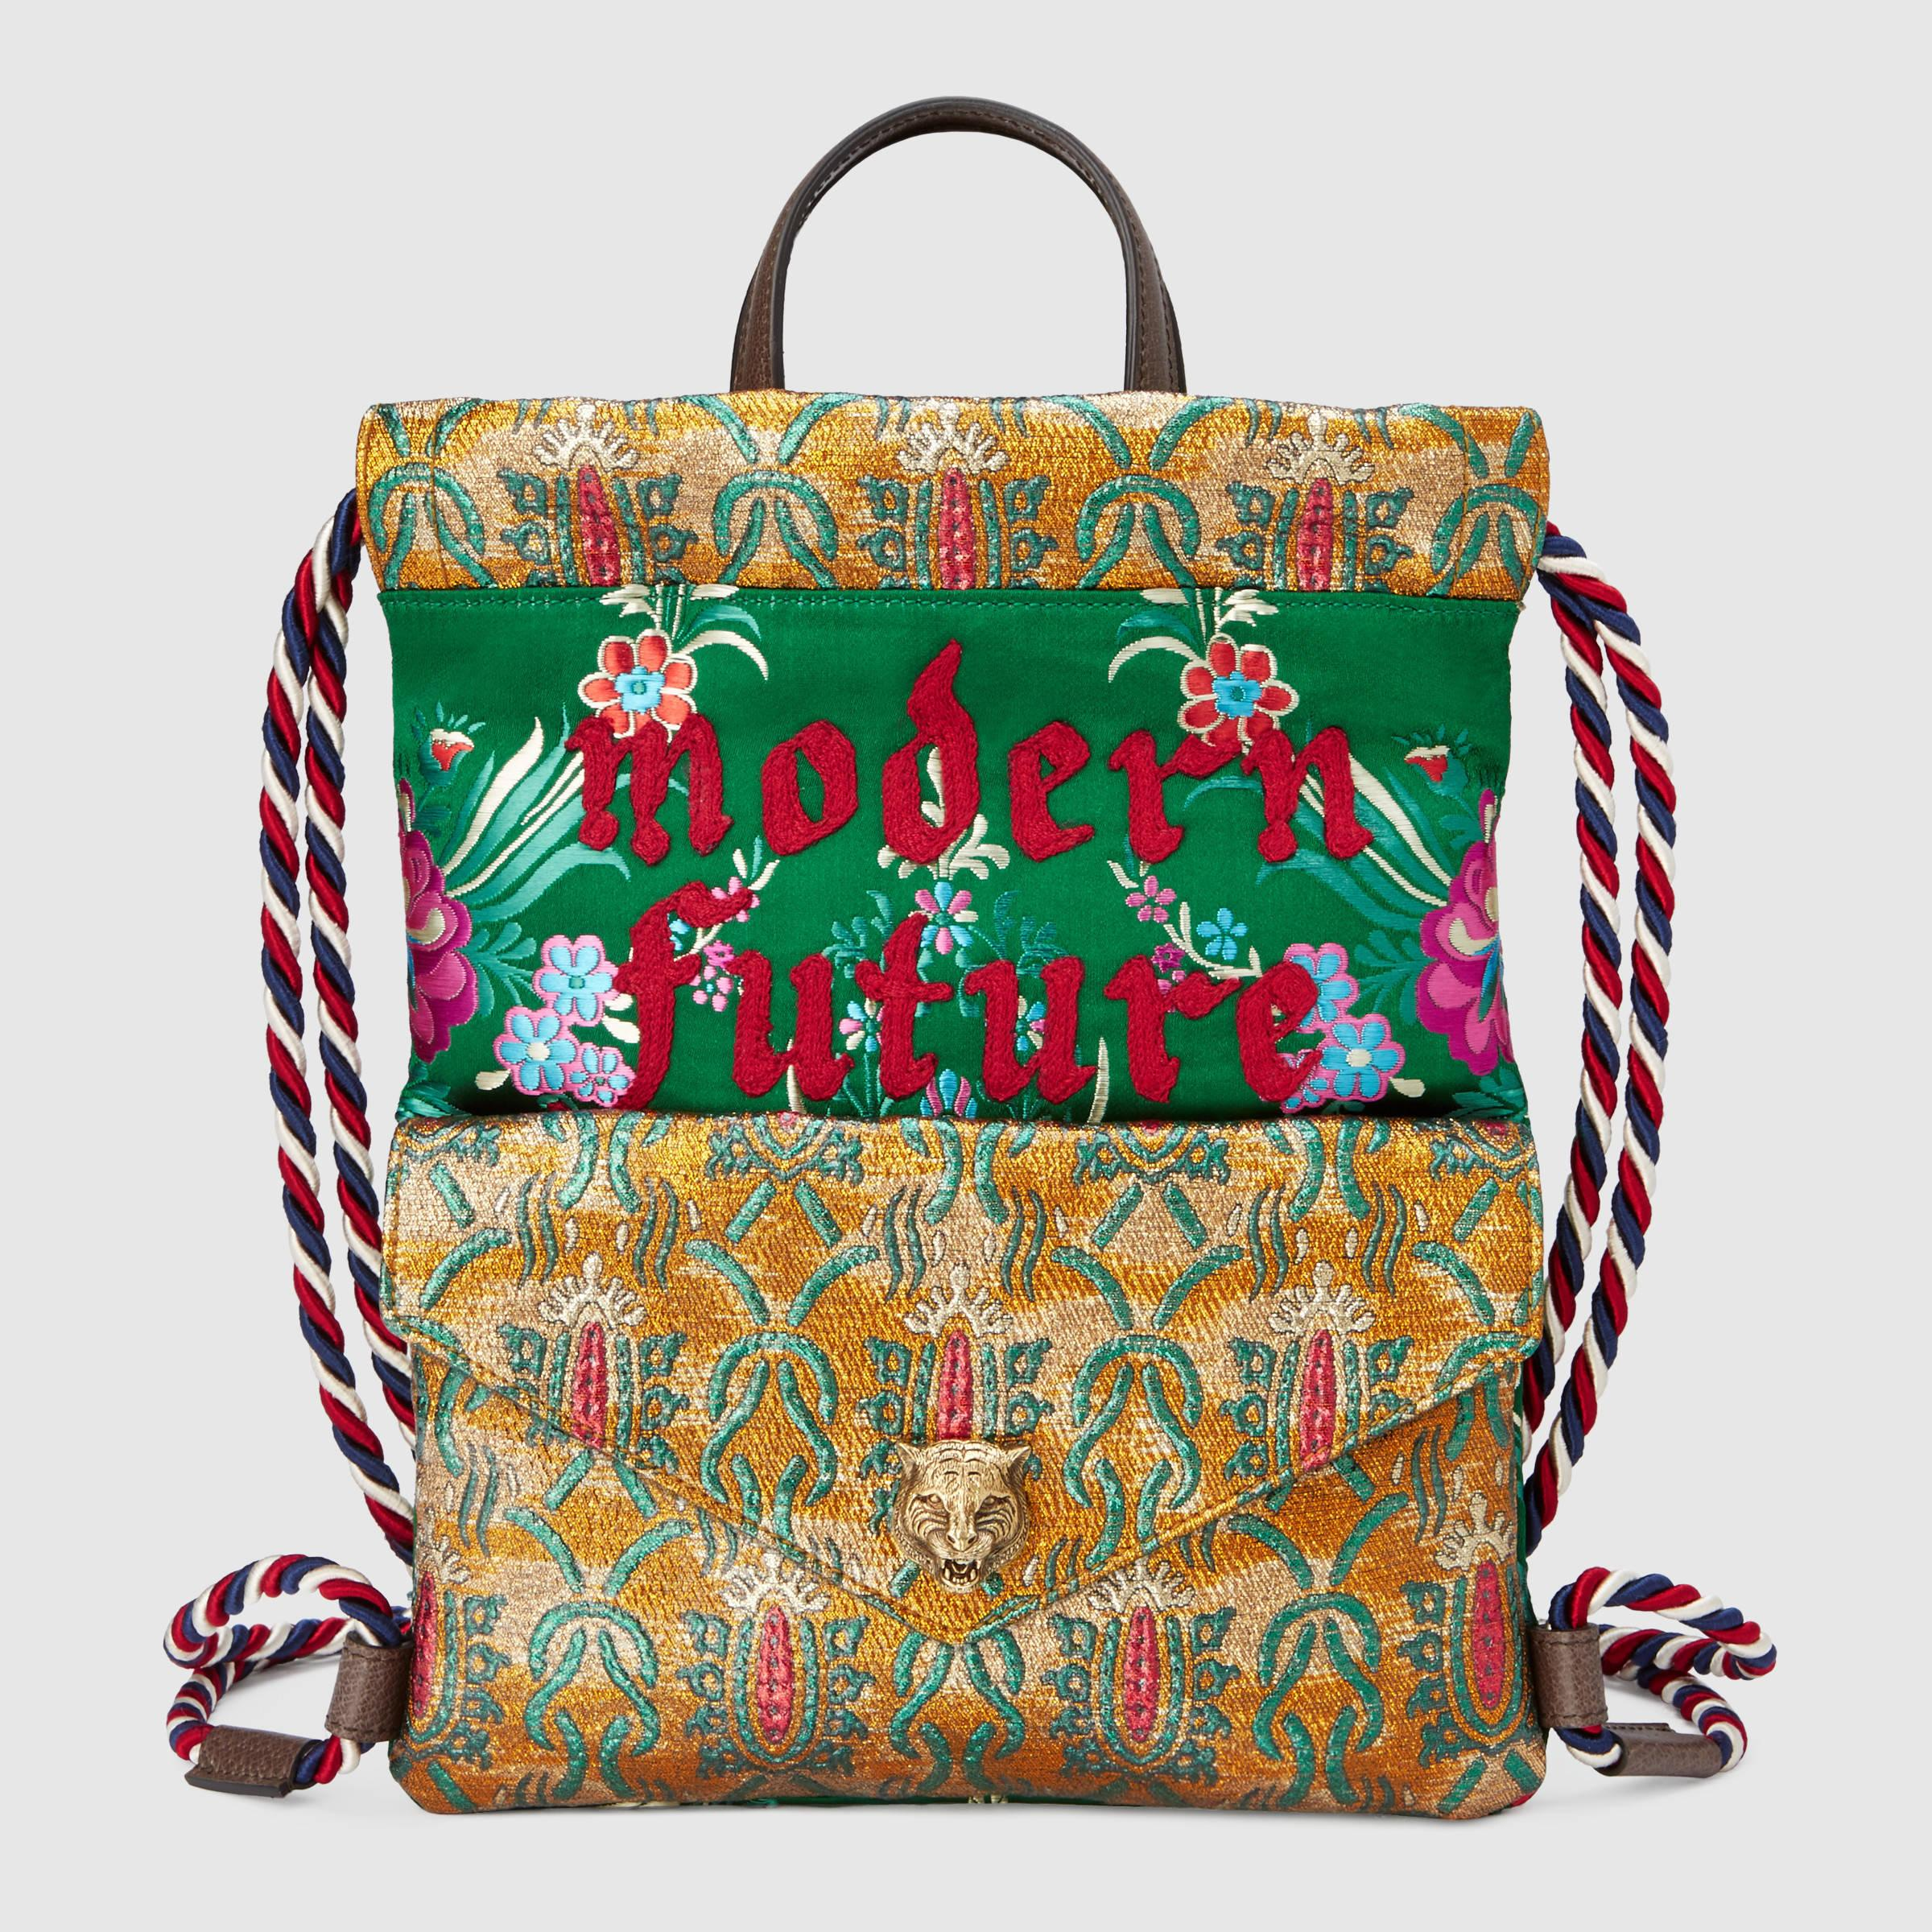 0af7ad053fc2 Lyst - Gucci Brocade Drawstring Backpack